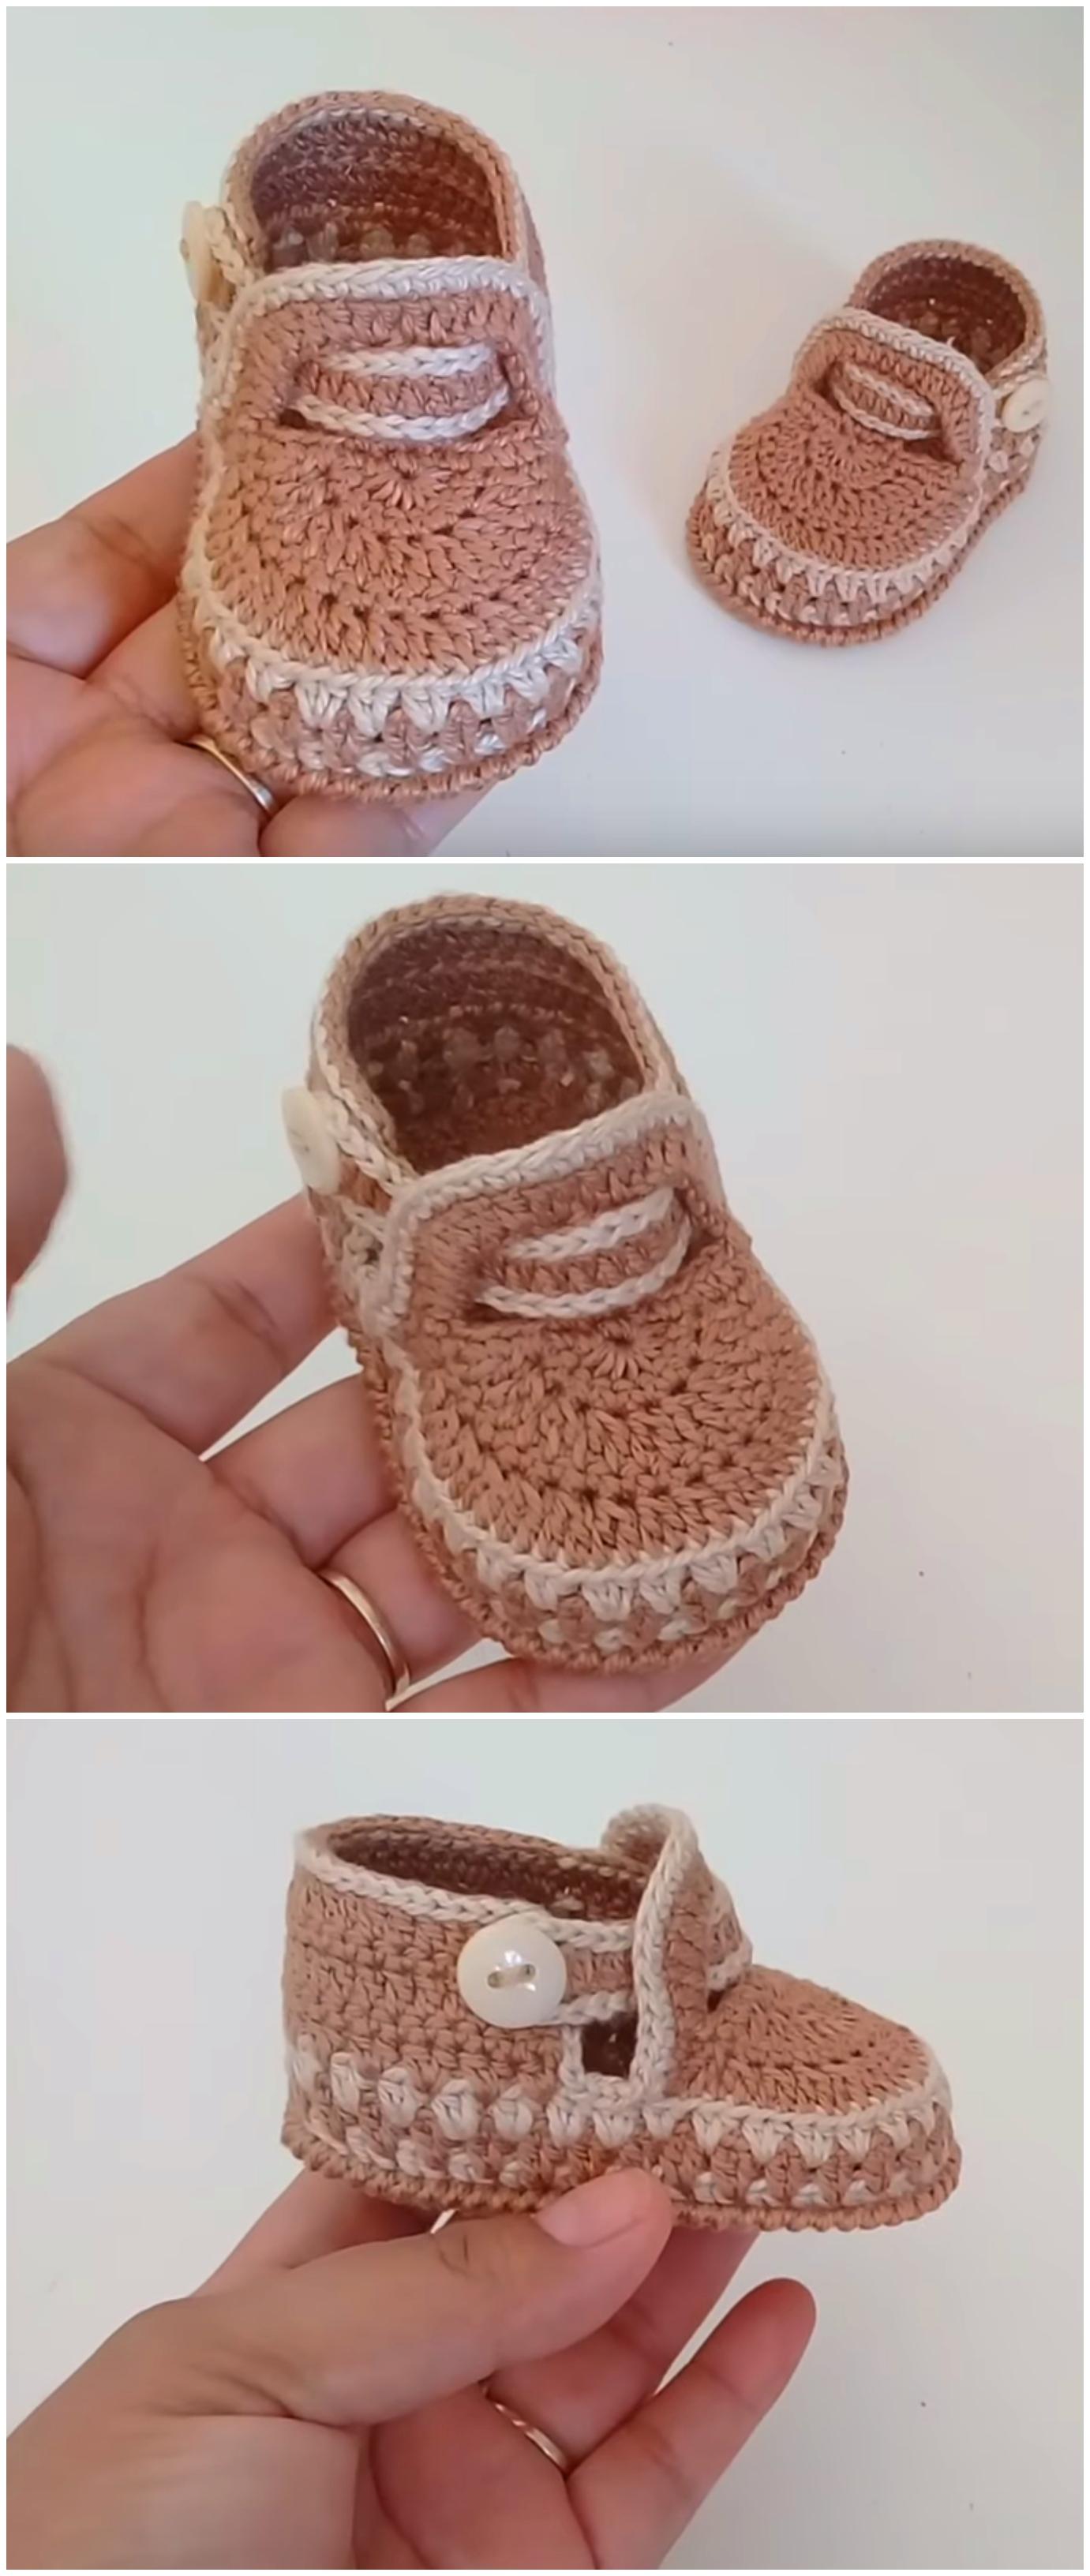 Crochet Lovely Baby Shoes Video Tutorial Crochet Ideas